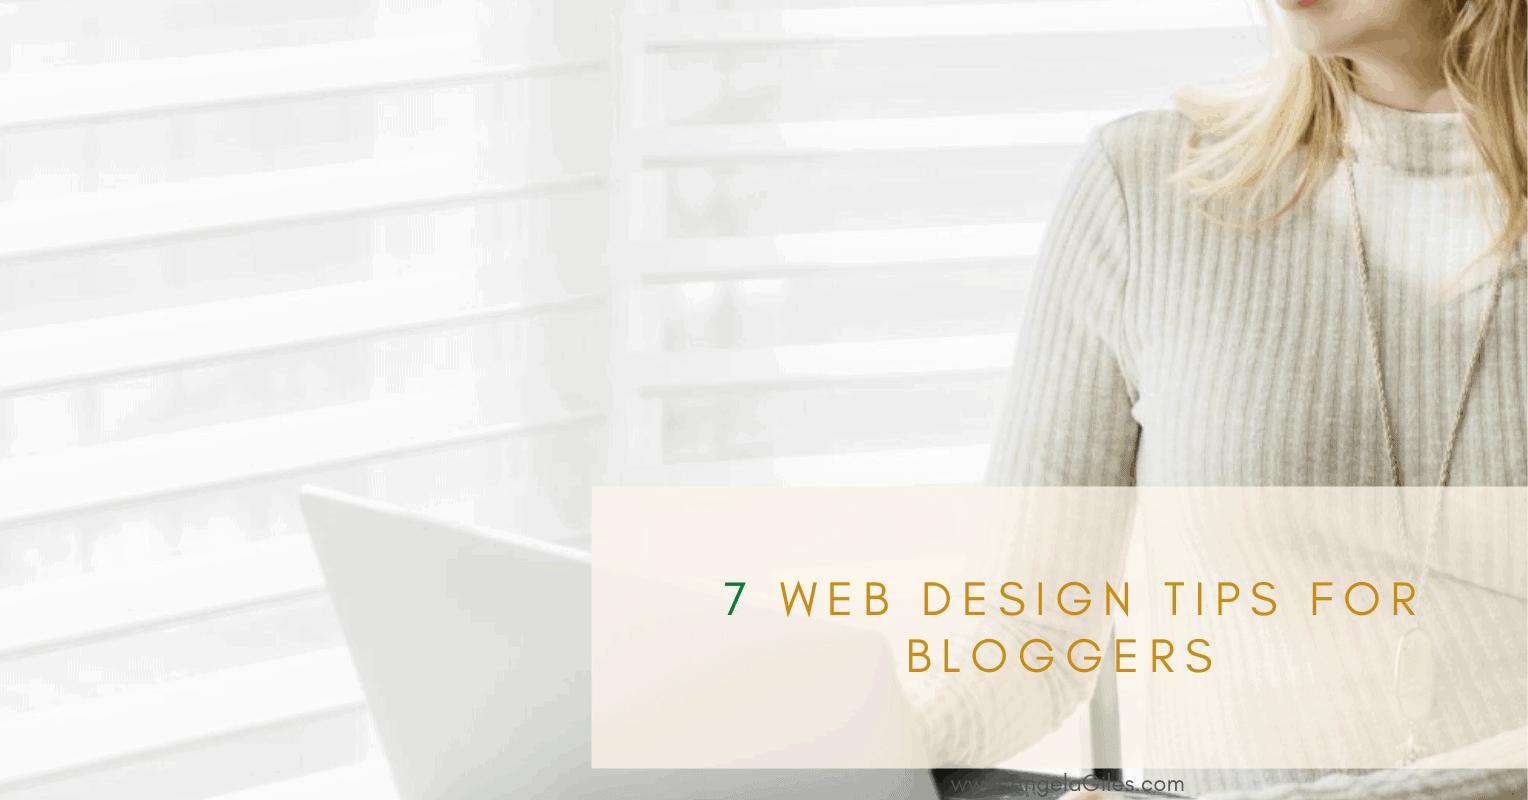 7 Website Design Tips for Bloggers